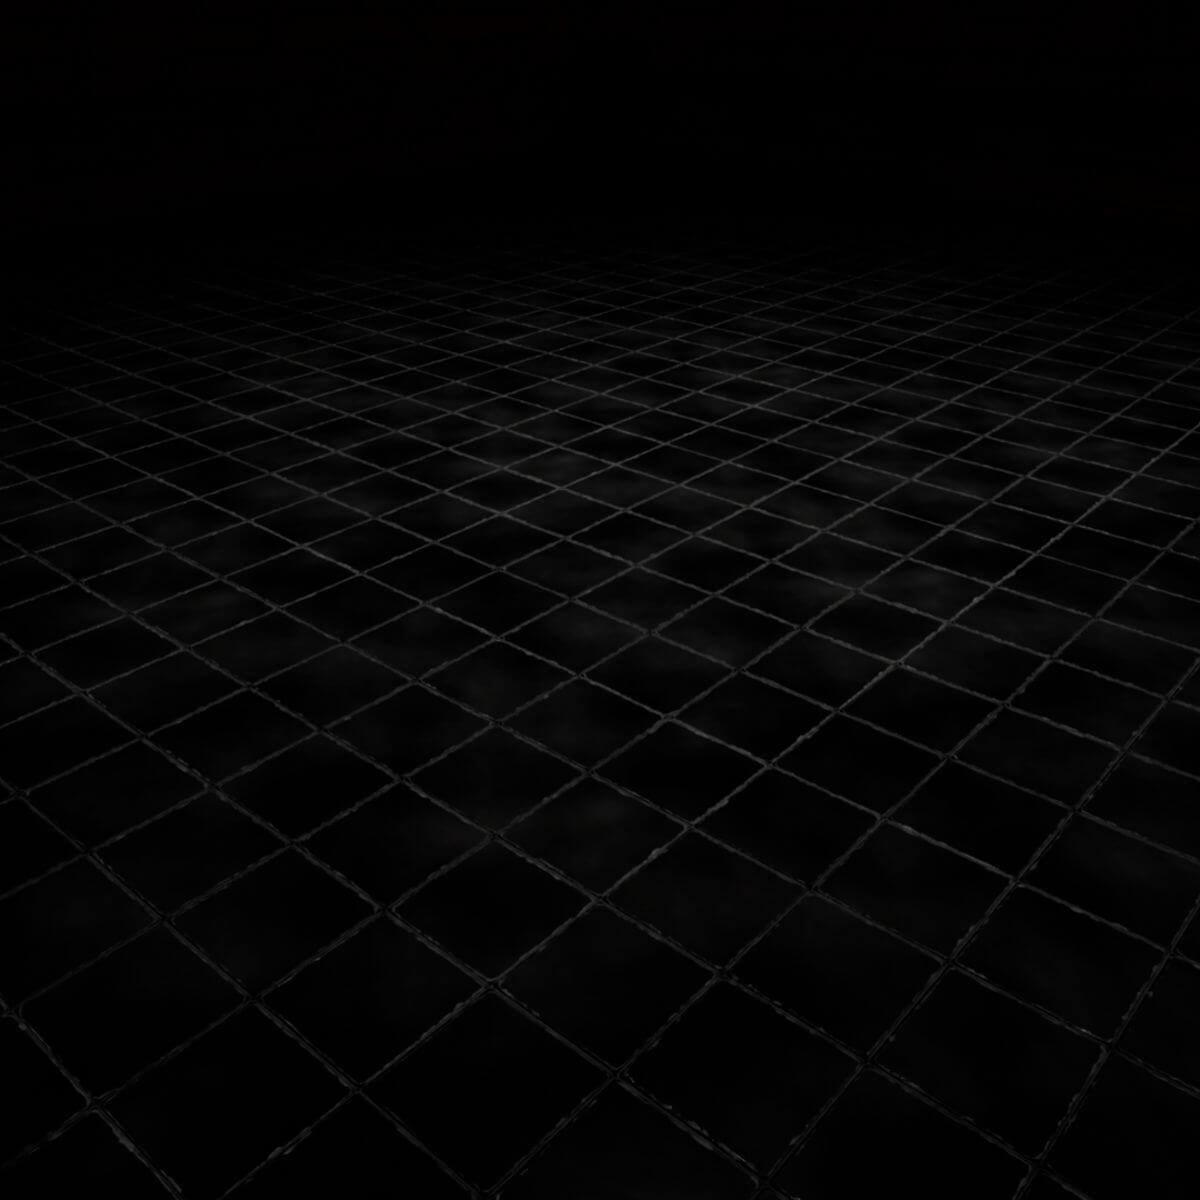 Stylized Black Floor Tiles Seamless Texture